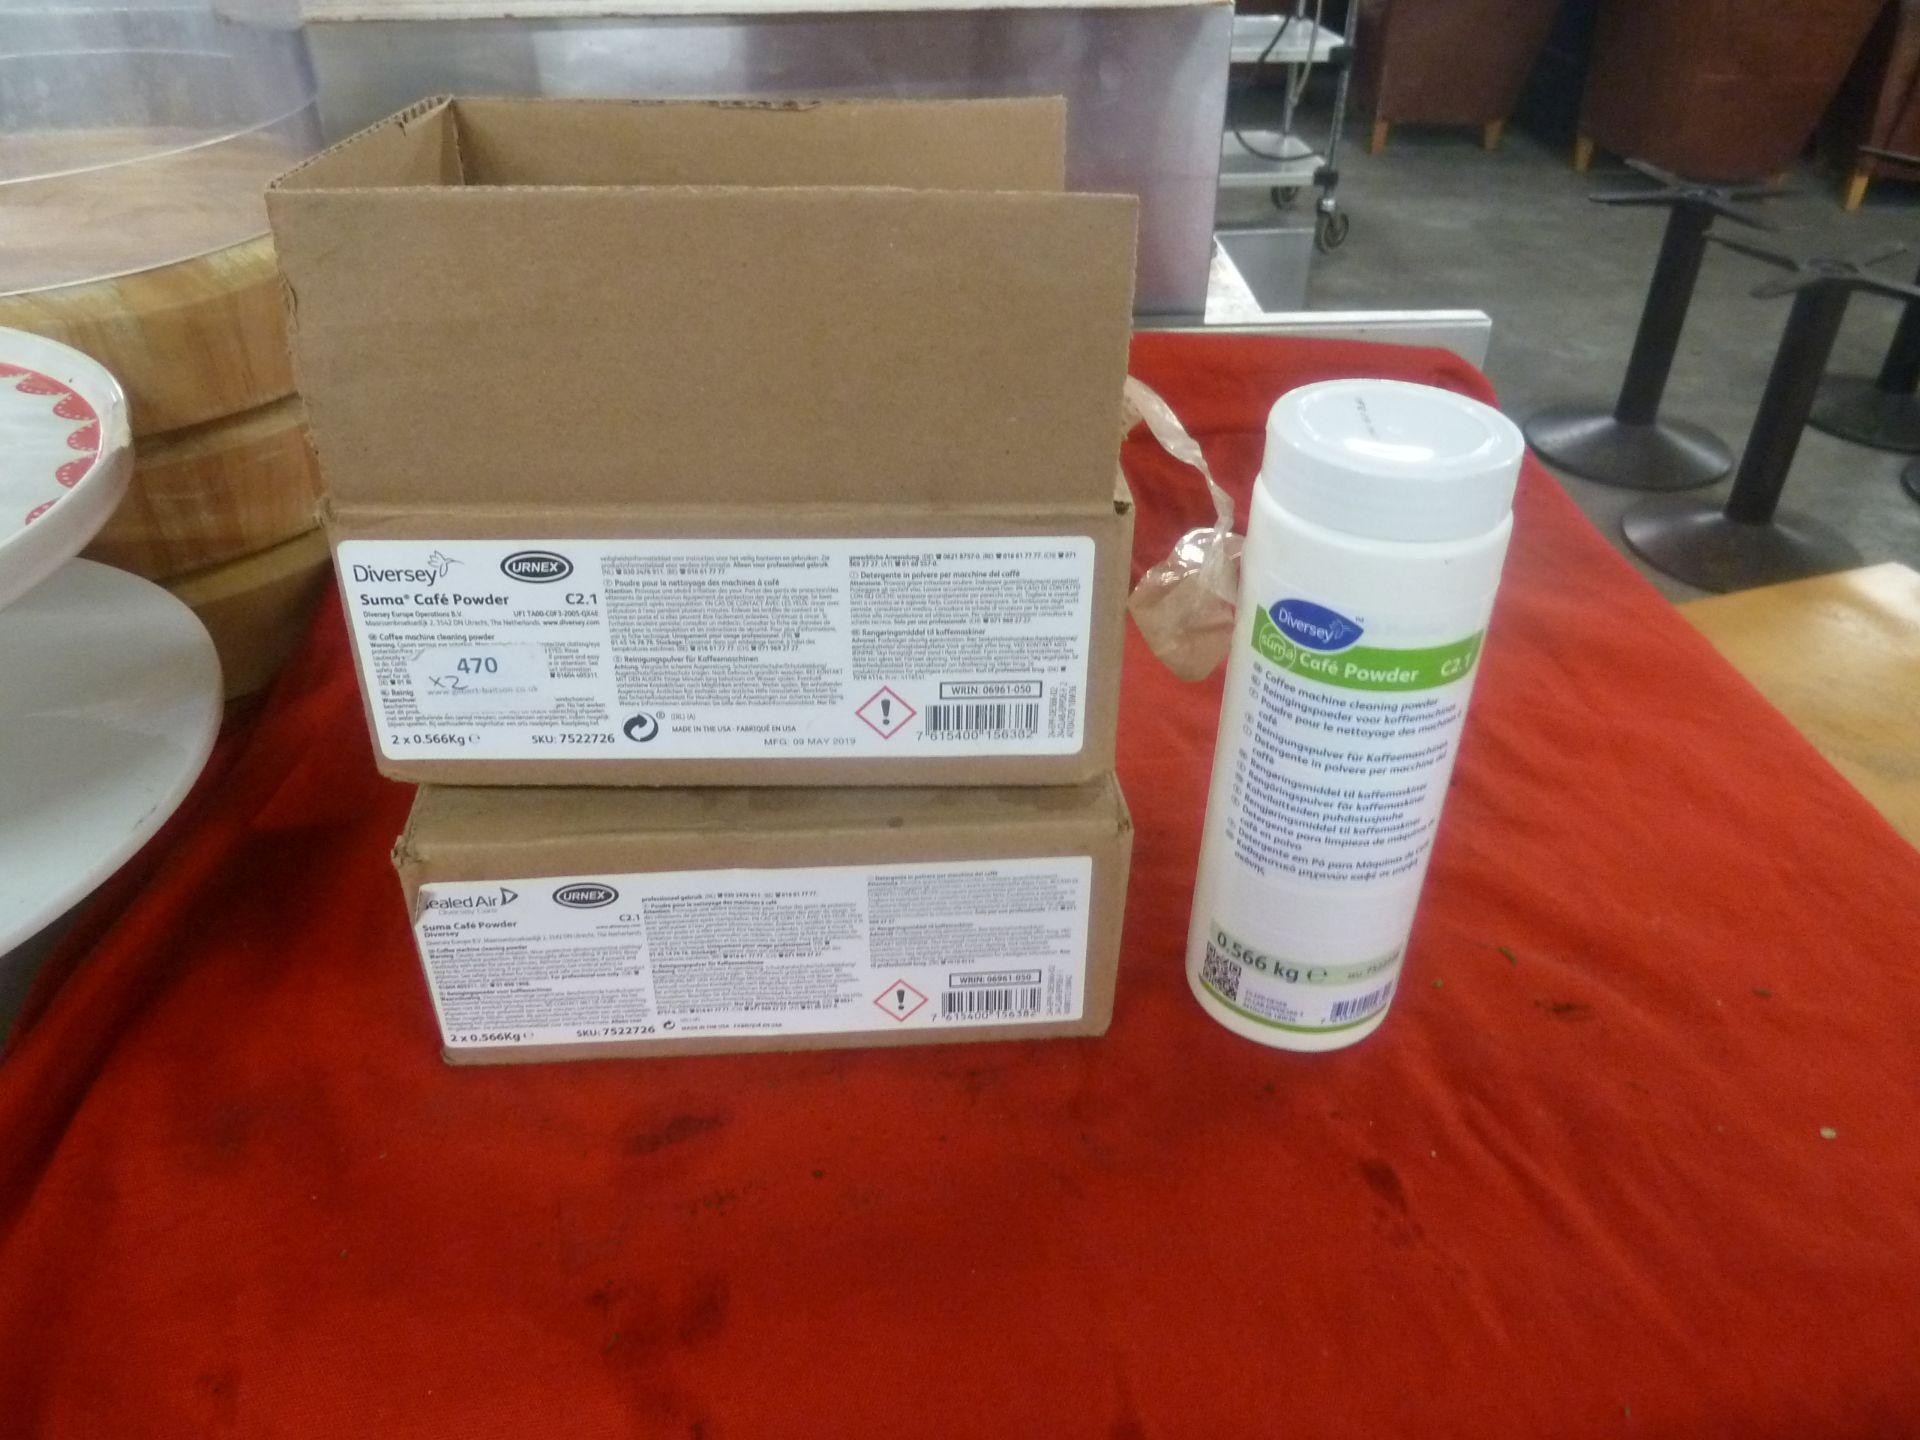 *C2.1 Suma coffee machine cleaner 2 x boxes